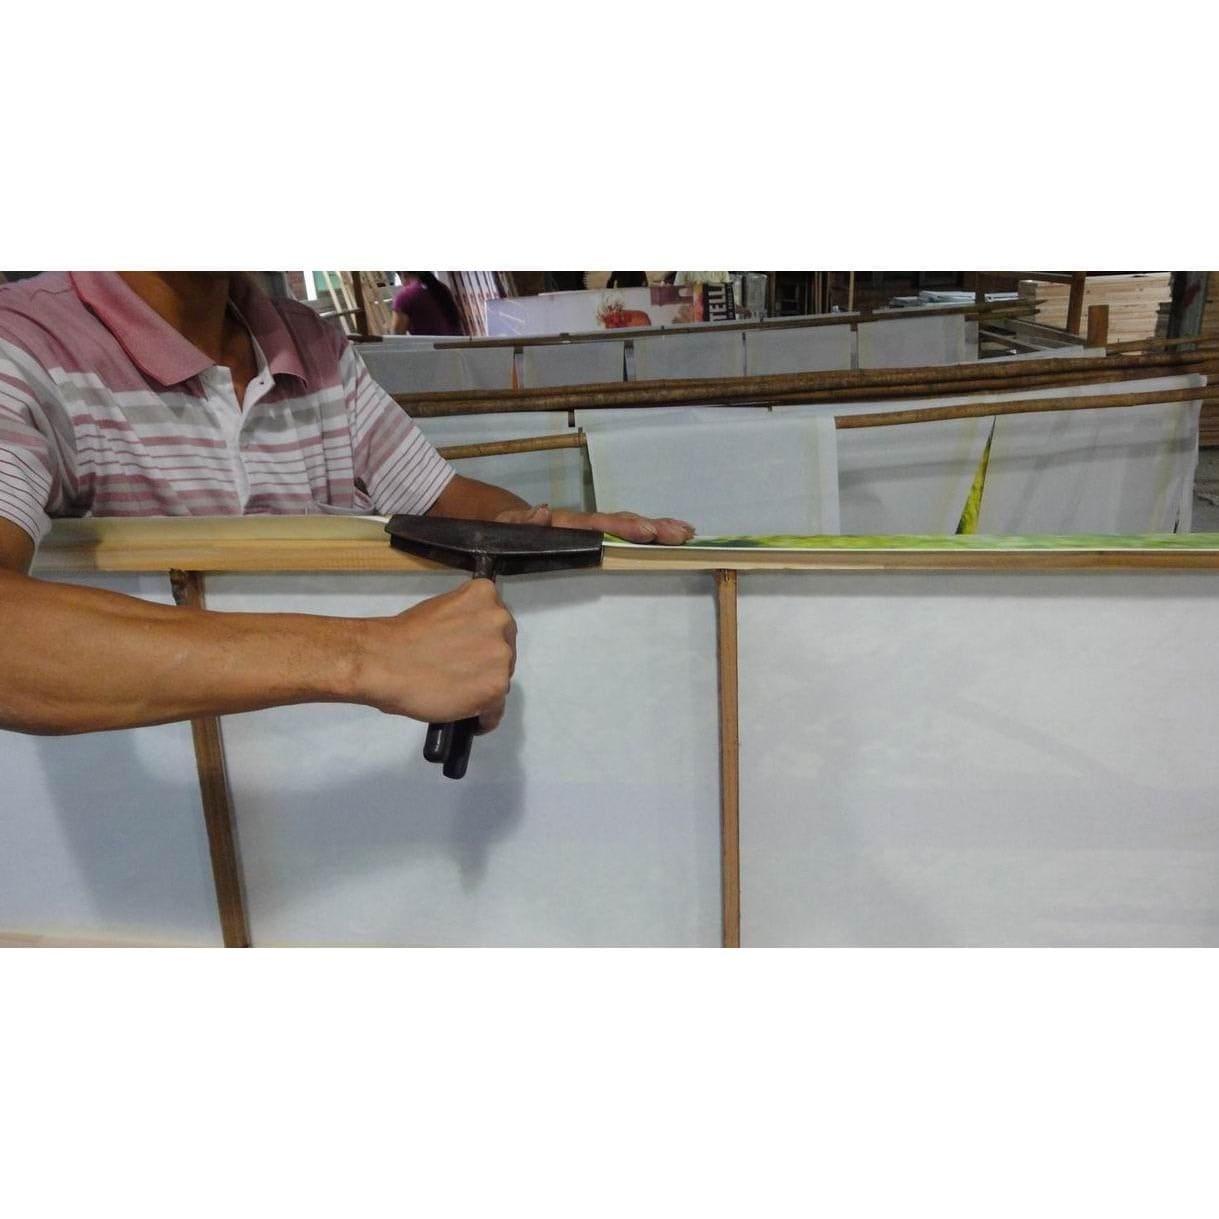 Shop Handmade Recycled Magazine 4 Foot Tall Room Divider China